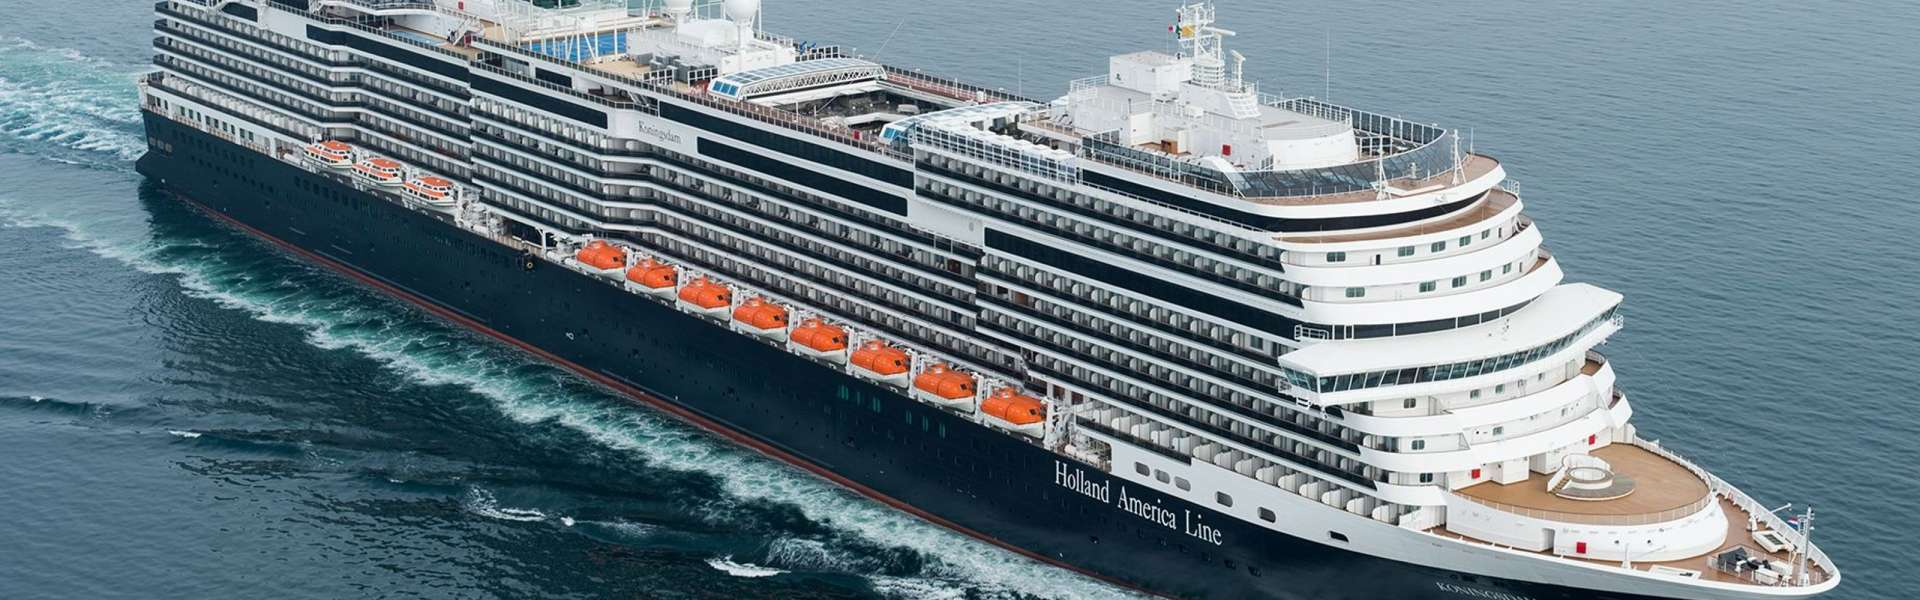 Croaziera 2019 - Mediterana de Vest (Roma/ Civitavecchia) - Holland America Line - ms Koningsdam - 10 nopti